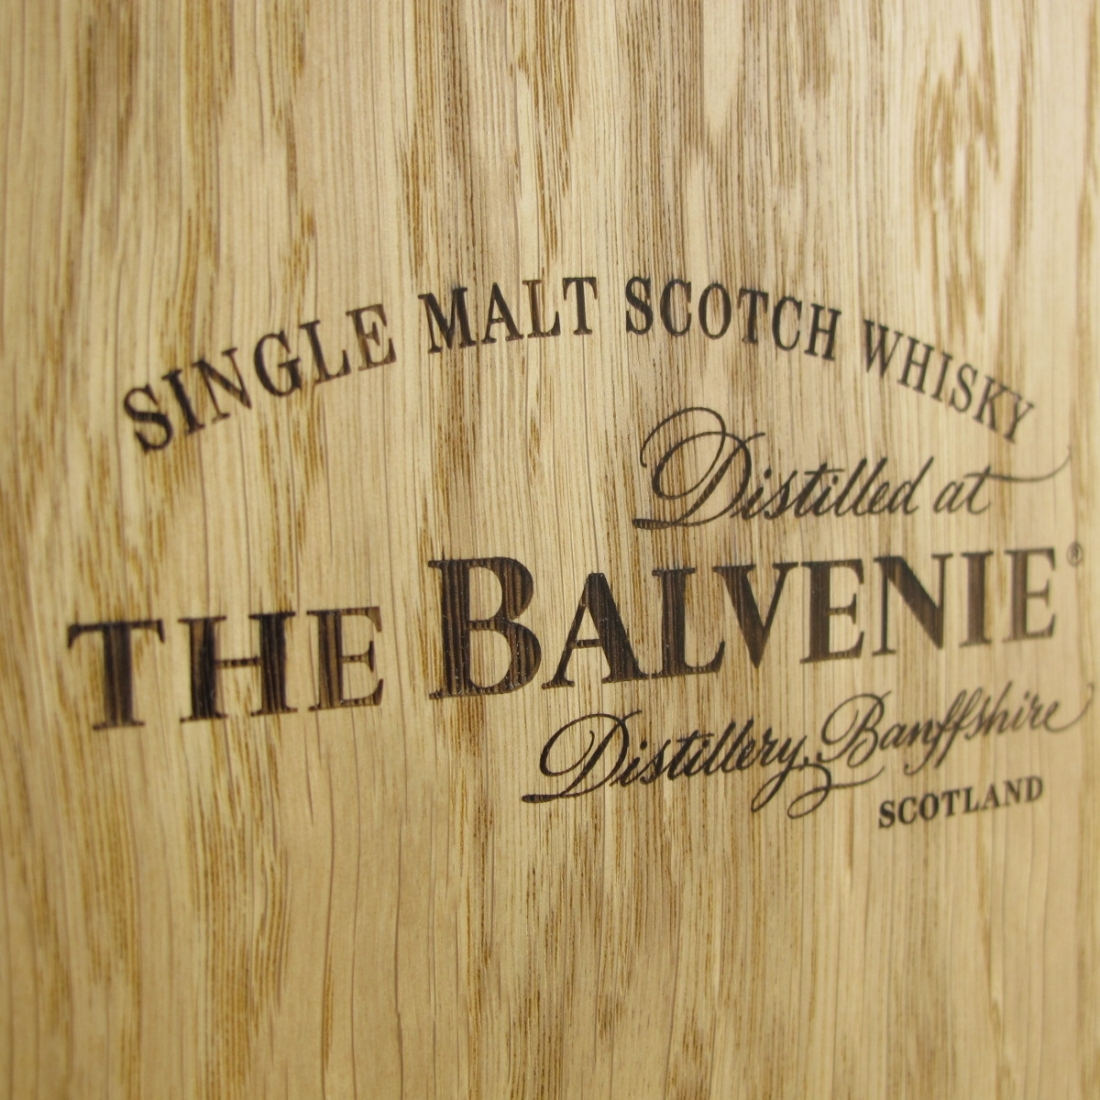 Balvenie 1990 DCS Compendium 25 Year Old Chapter #2